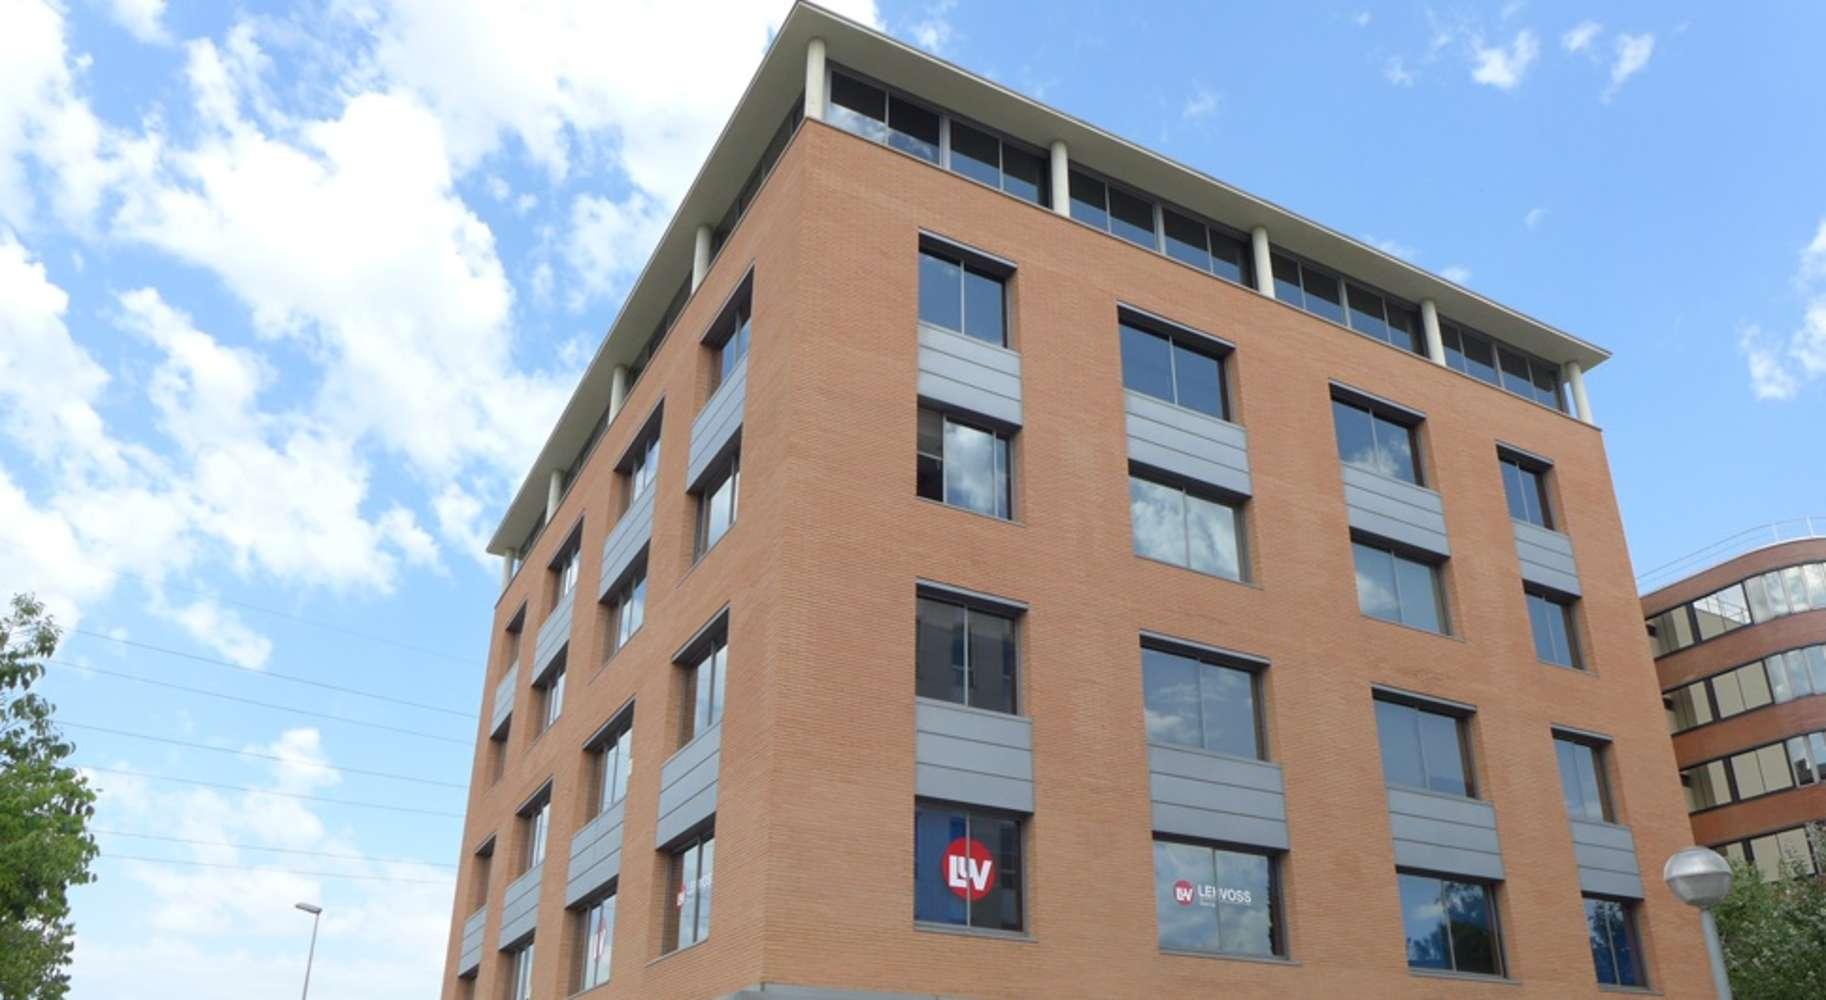 Oficina Sant just desvern, 08960 - Edificio Blasco de Garay - 9271